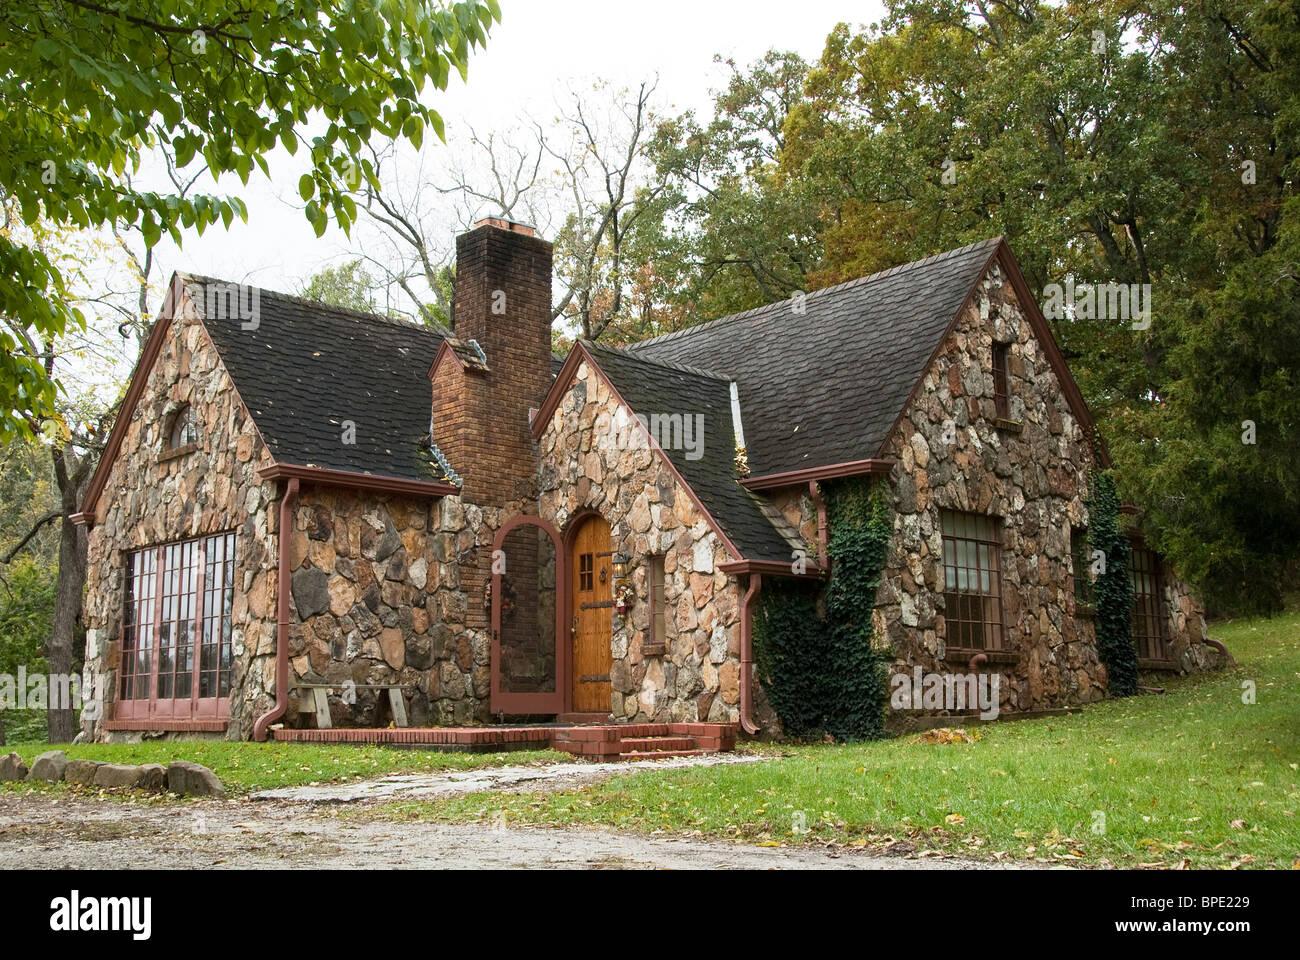 Laura Ingalls Wilder Historic Home Rocky Ridge Rock House Mansfield Missouri USA Stock Photo